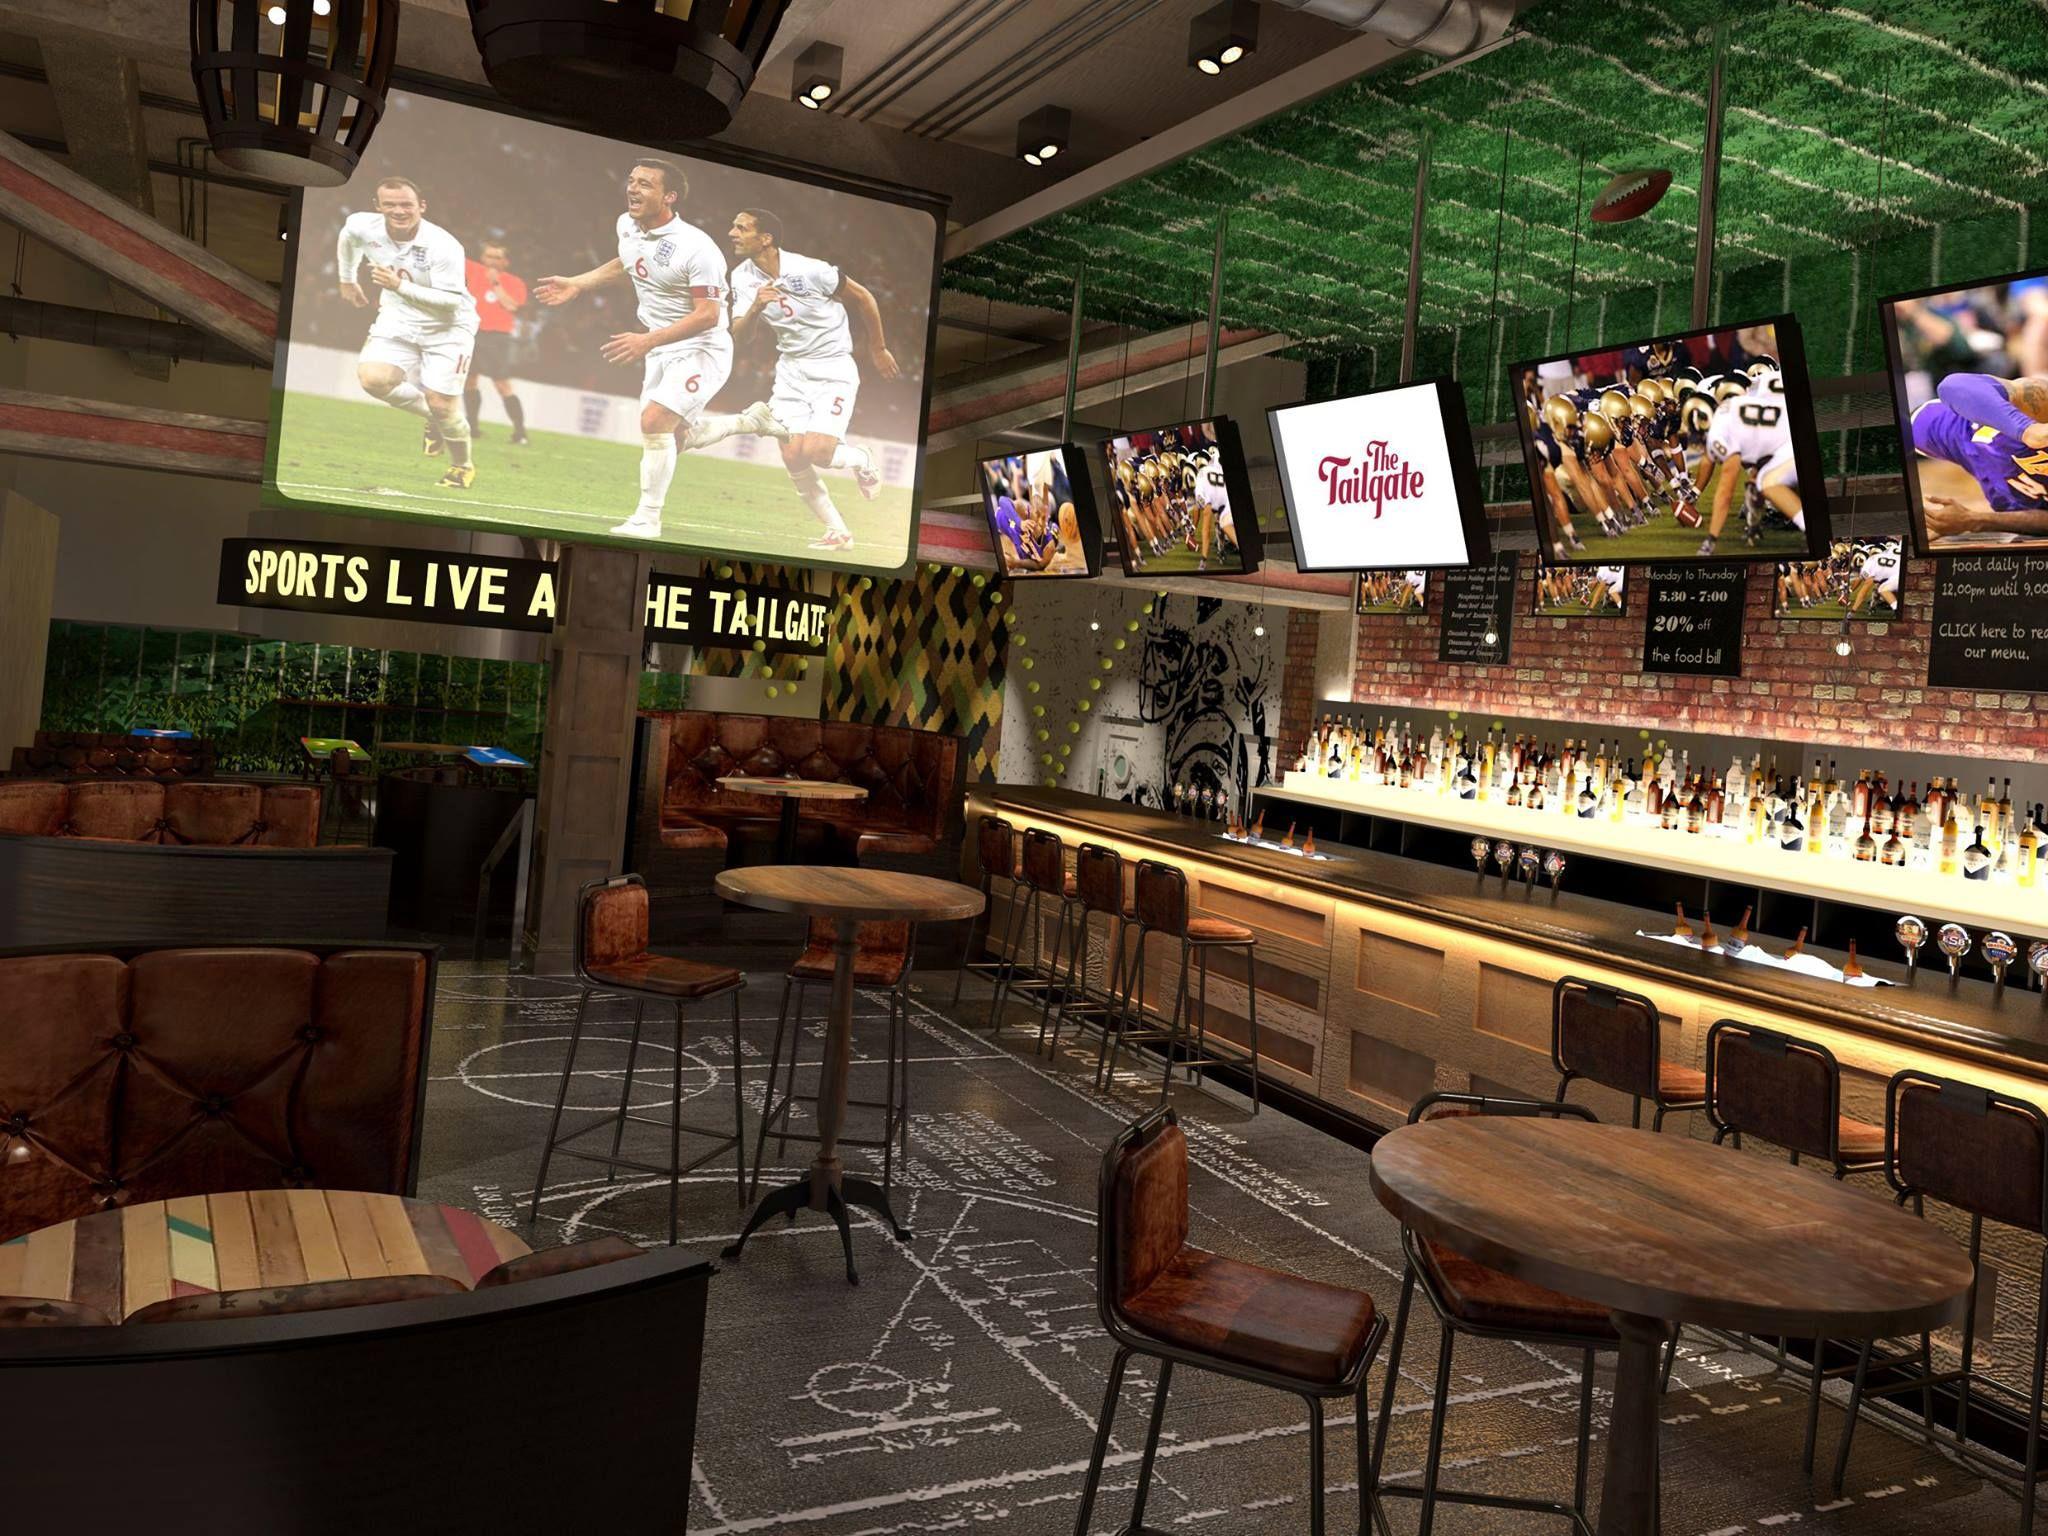 sports bar google search bar pinterest sport bar design bar and bar interior. Black Bedroom Furniture Sets. Home Design Ideas